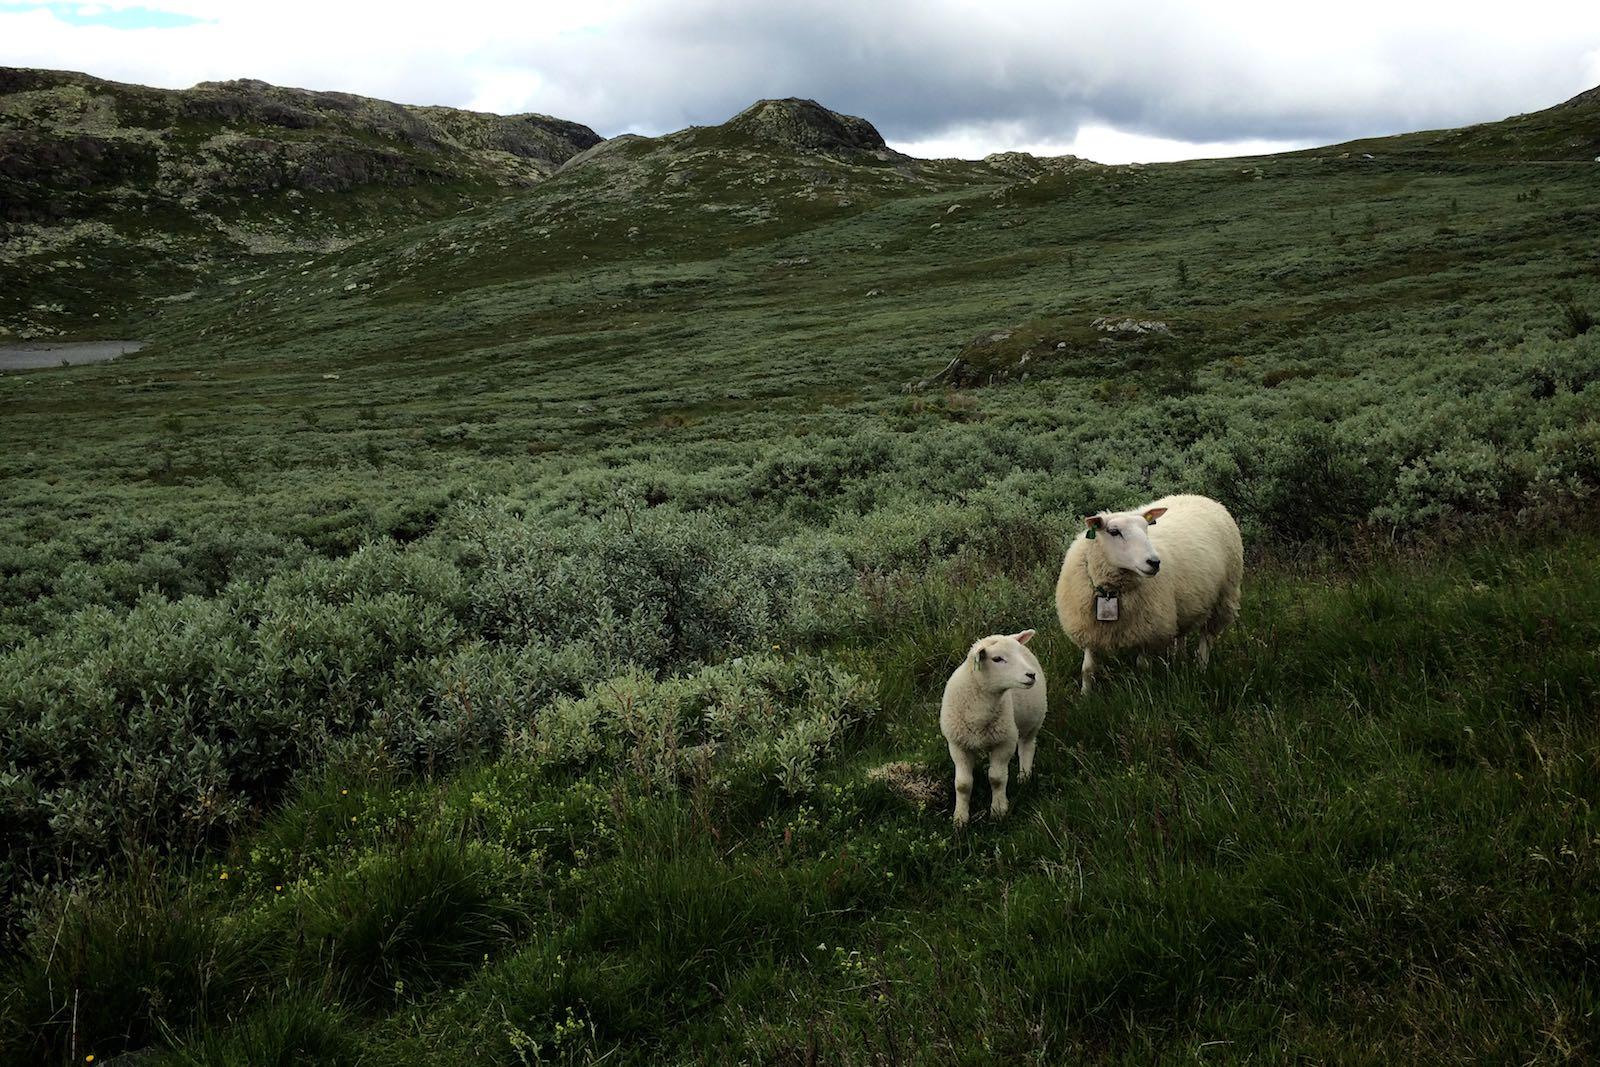 Owce w okolicach Gaustatoppen